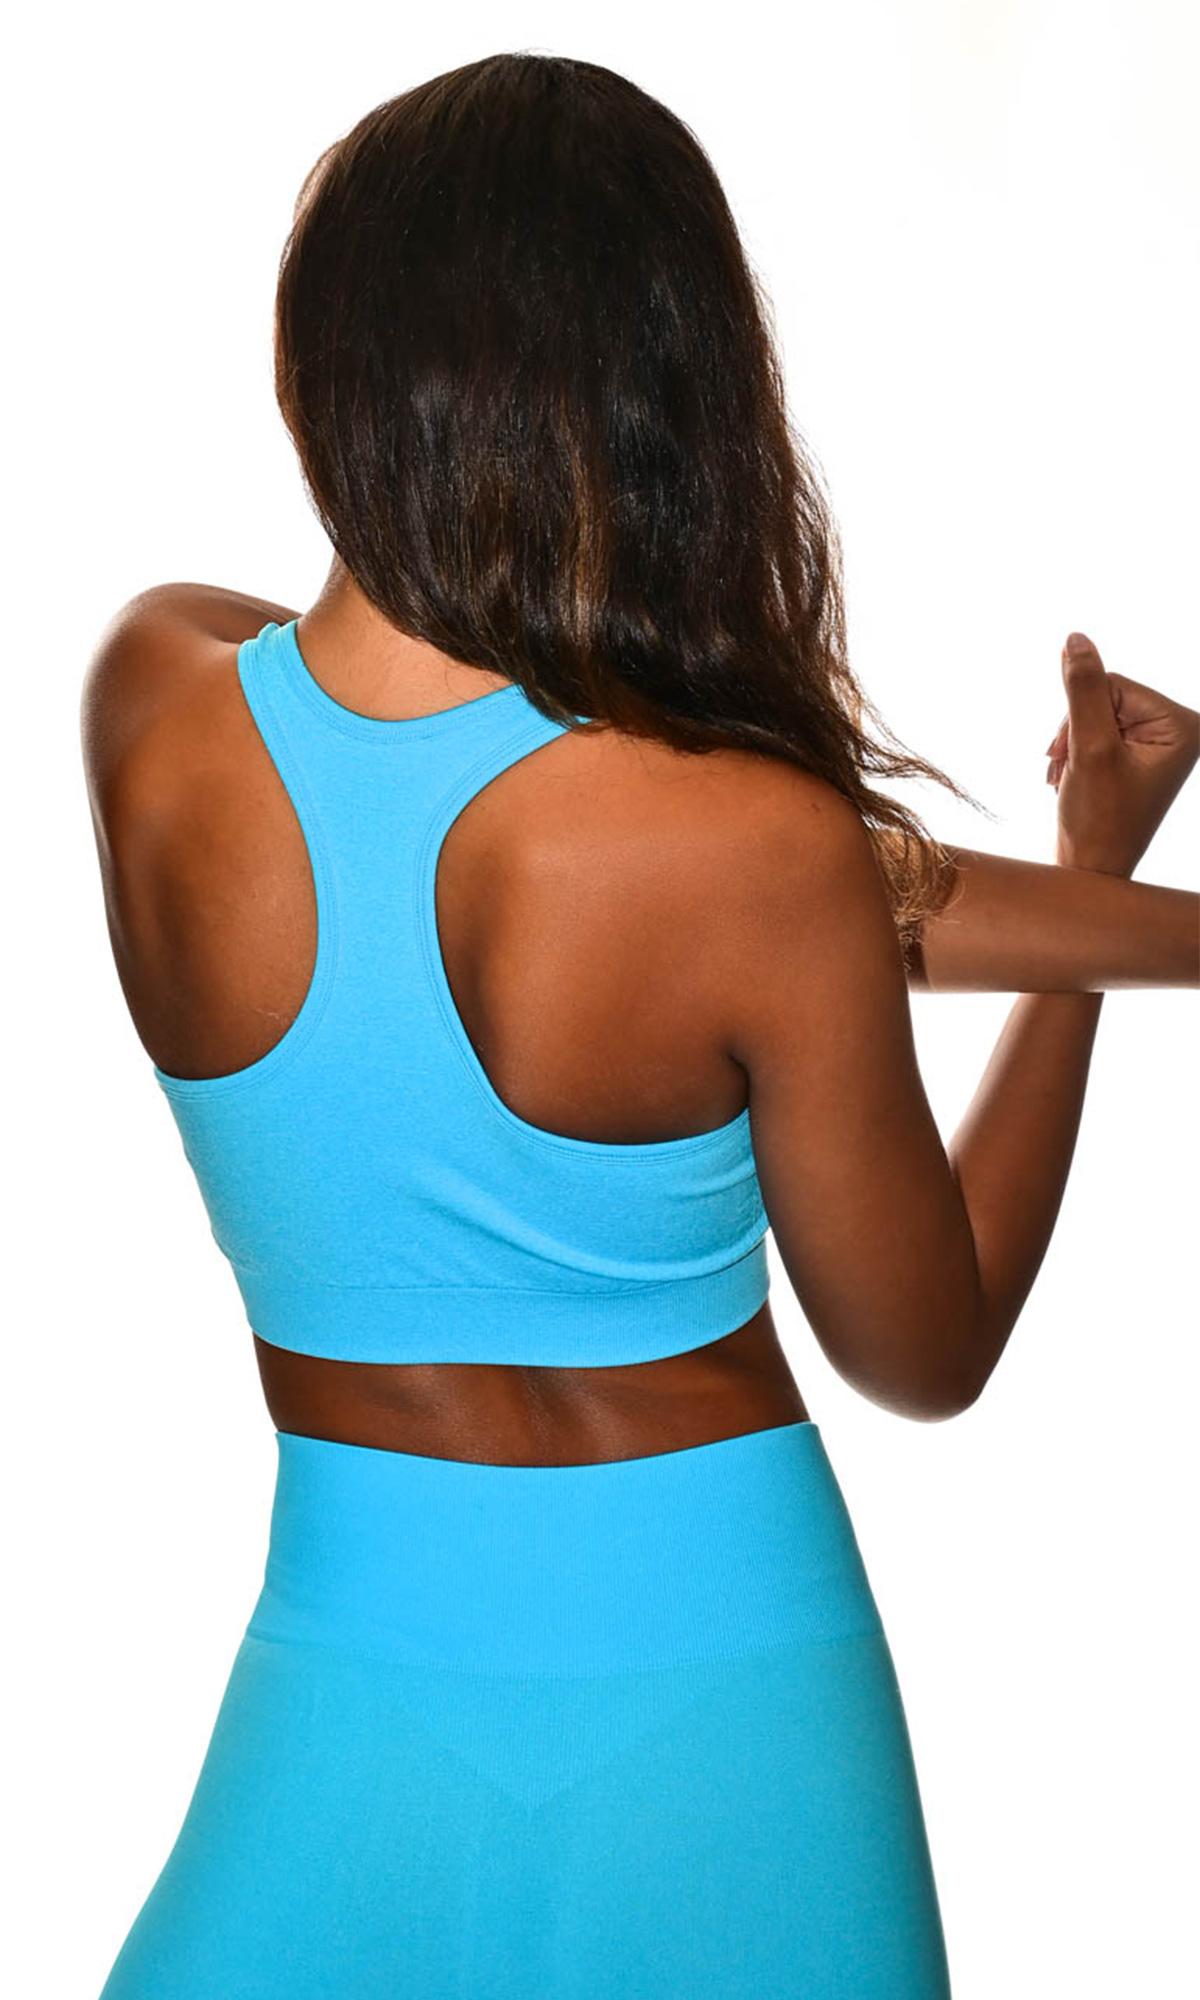 blue-bra-back-hb